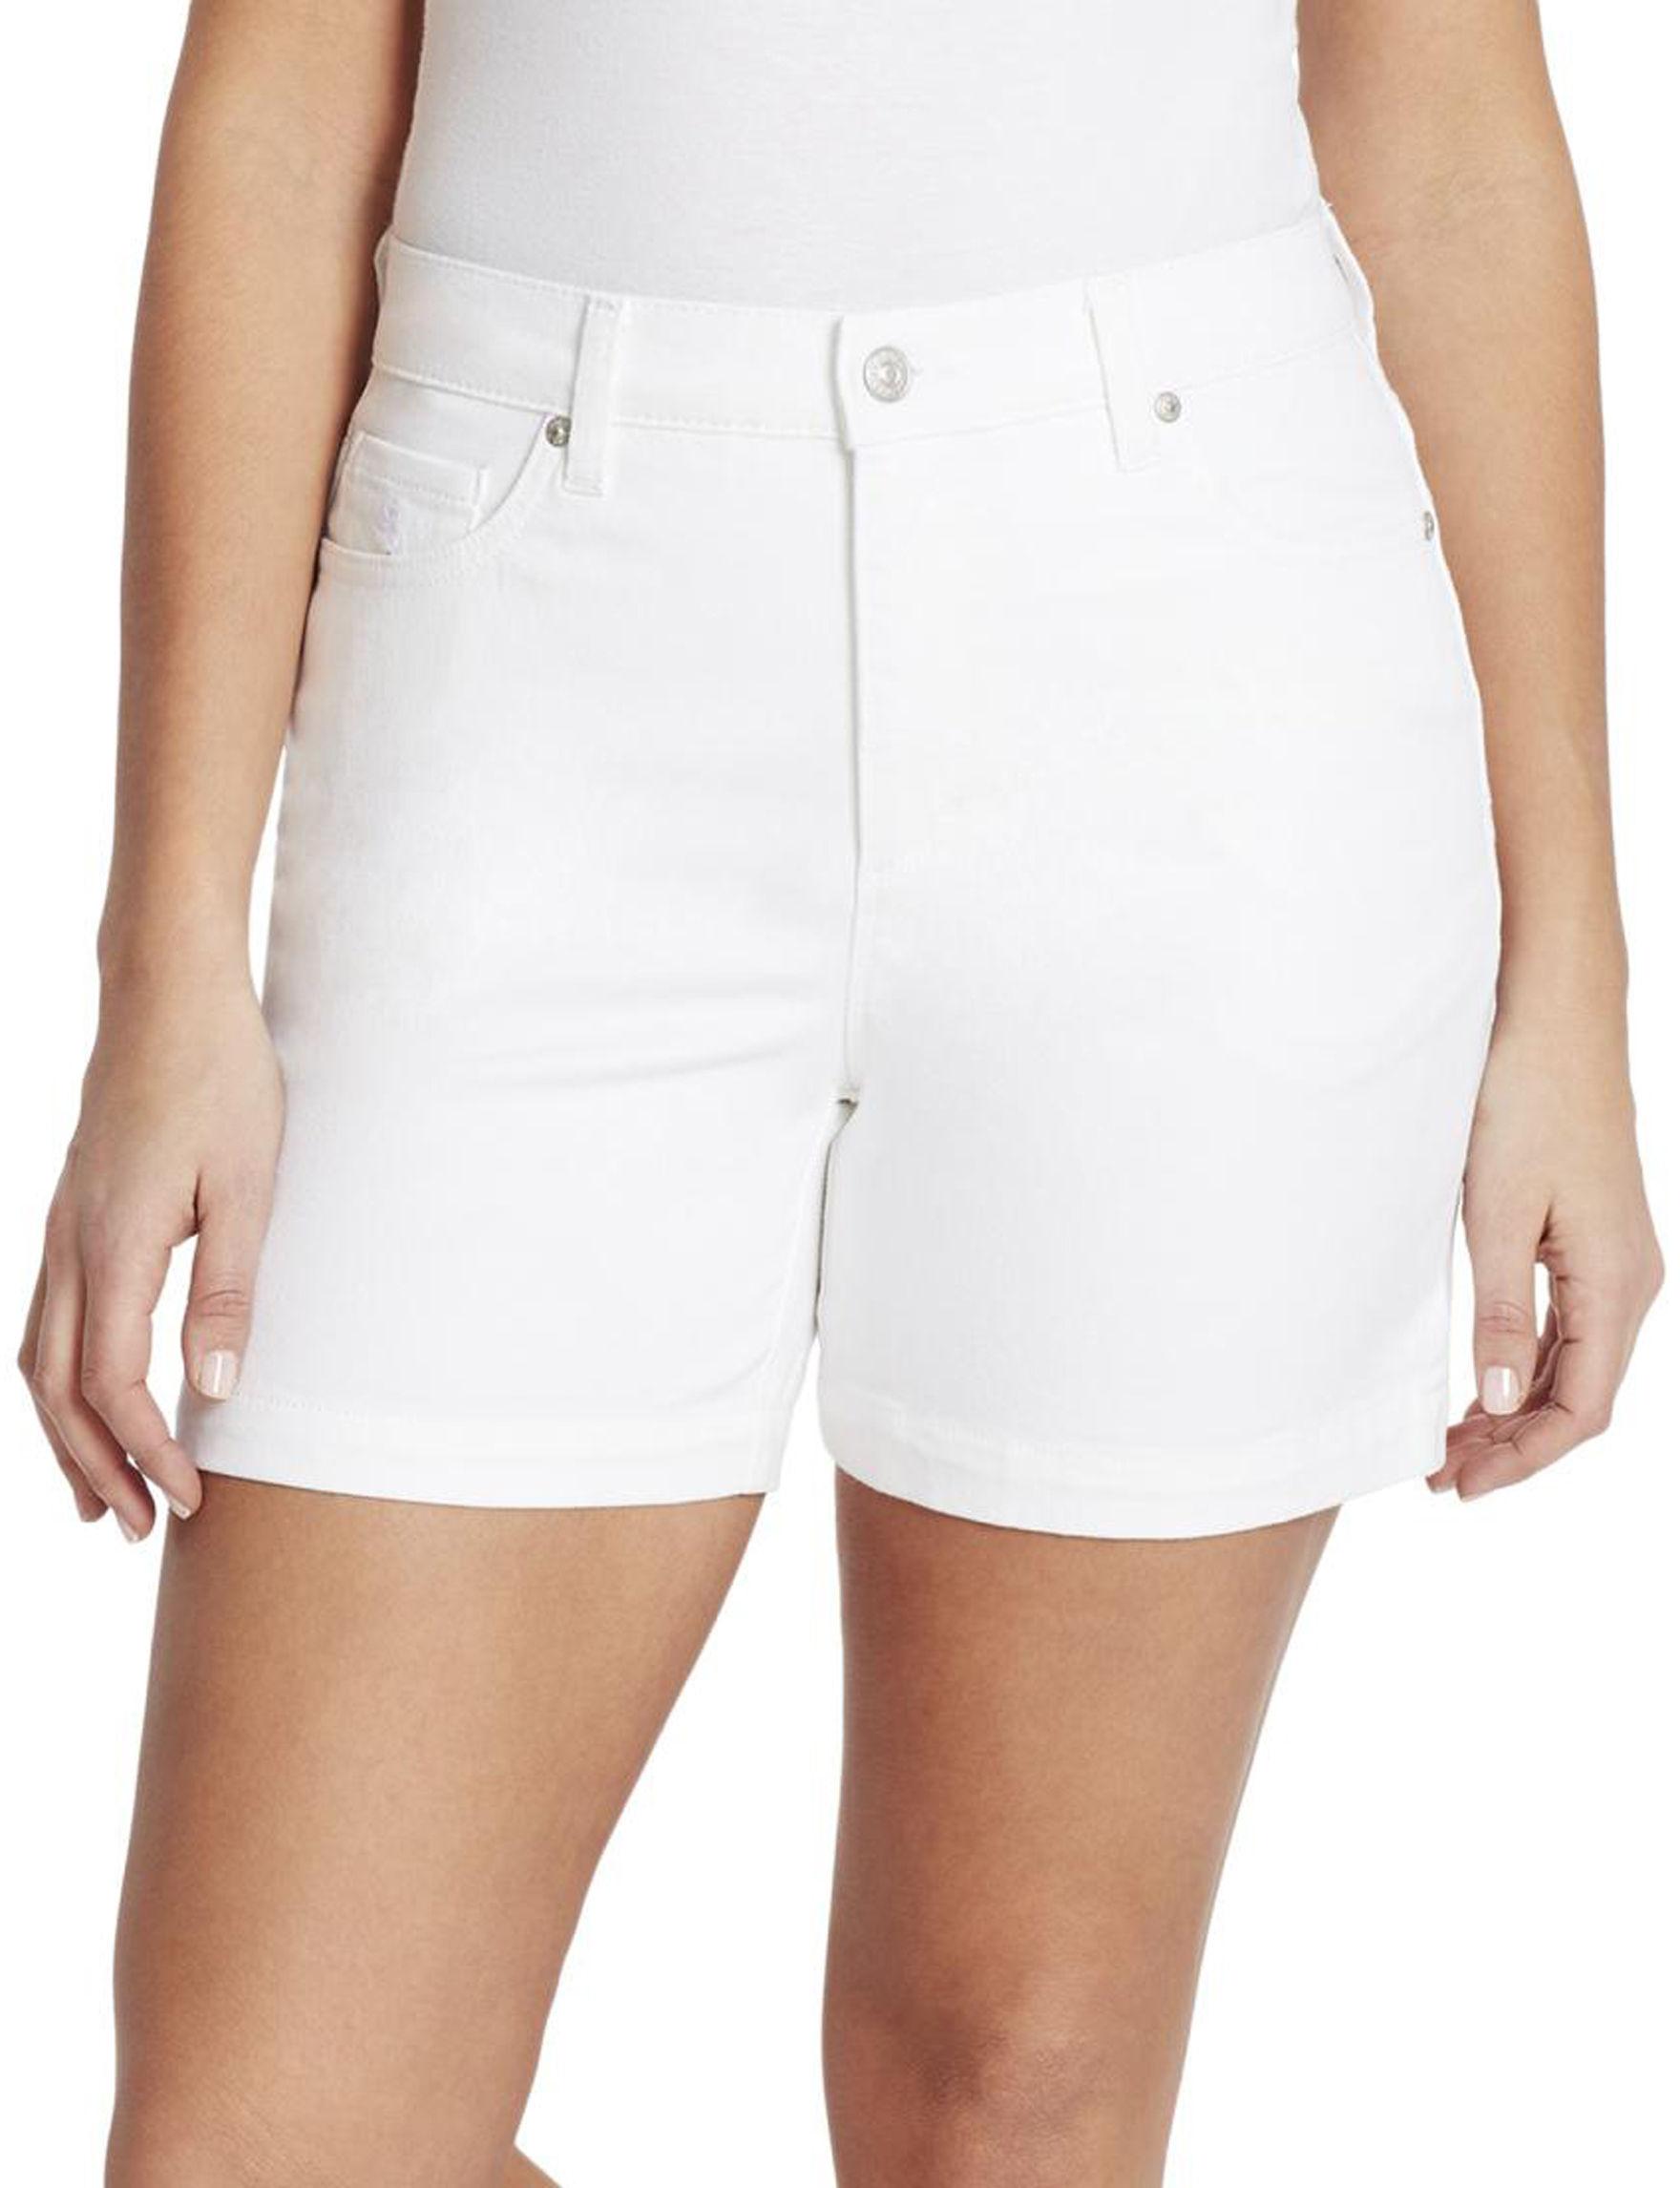 Gloria Vanderbilt White Tailored Shorts